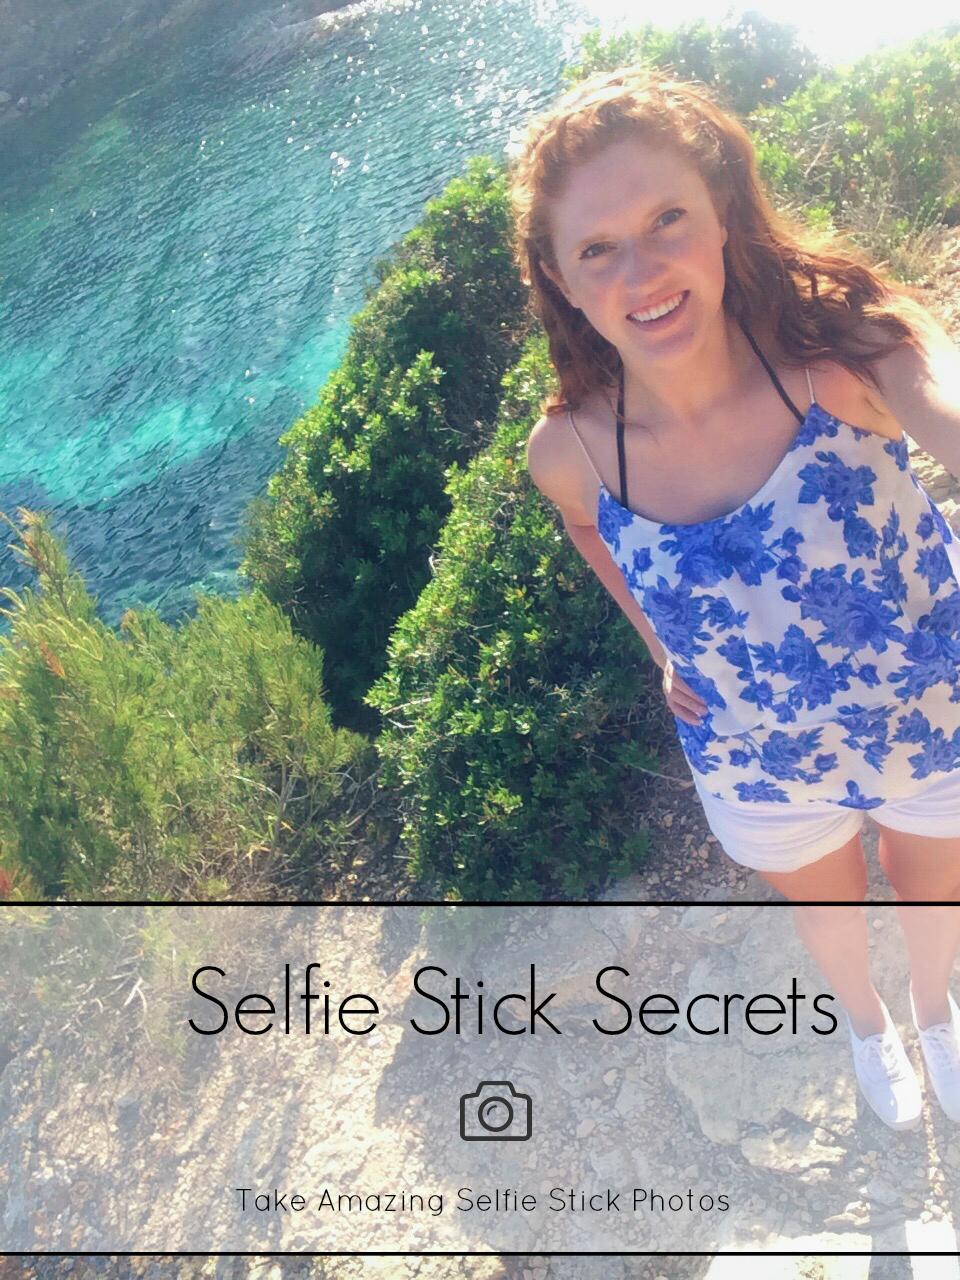 Selfie Stick Secret - Take Amazing Selfie Stick Photos